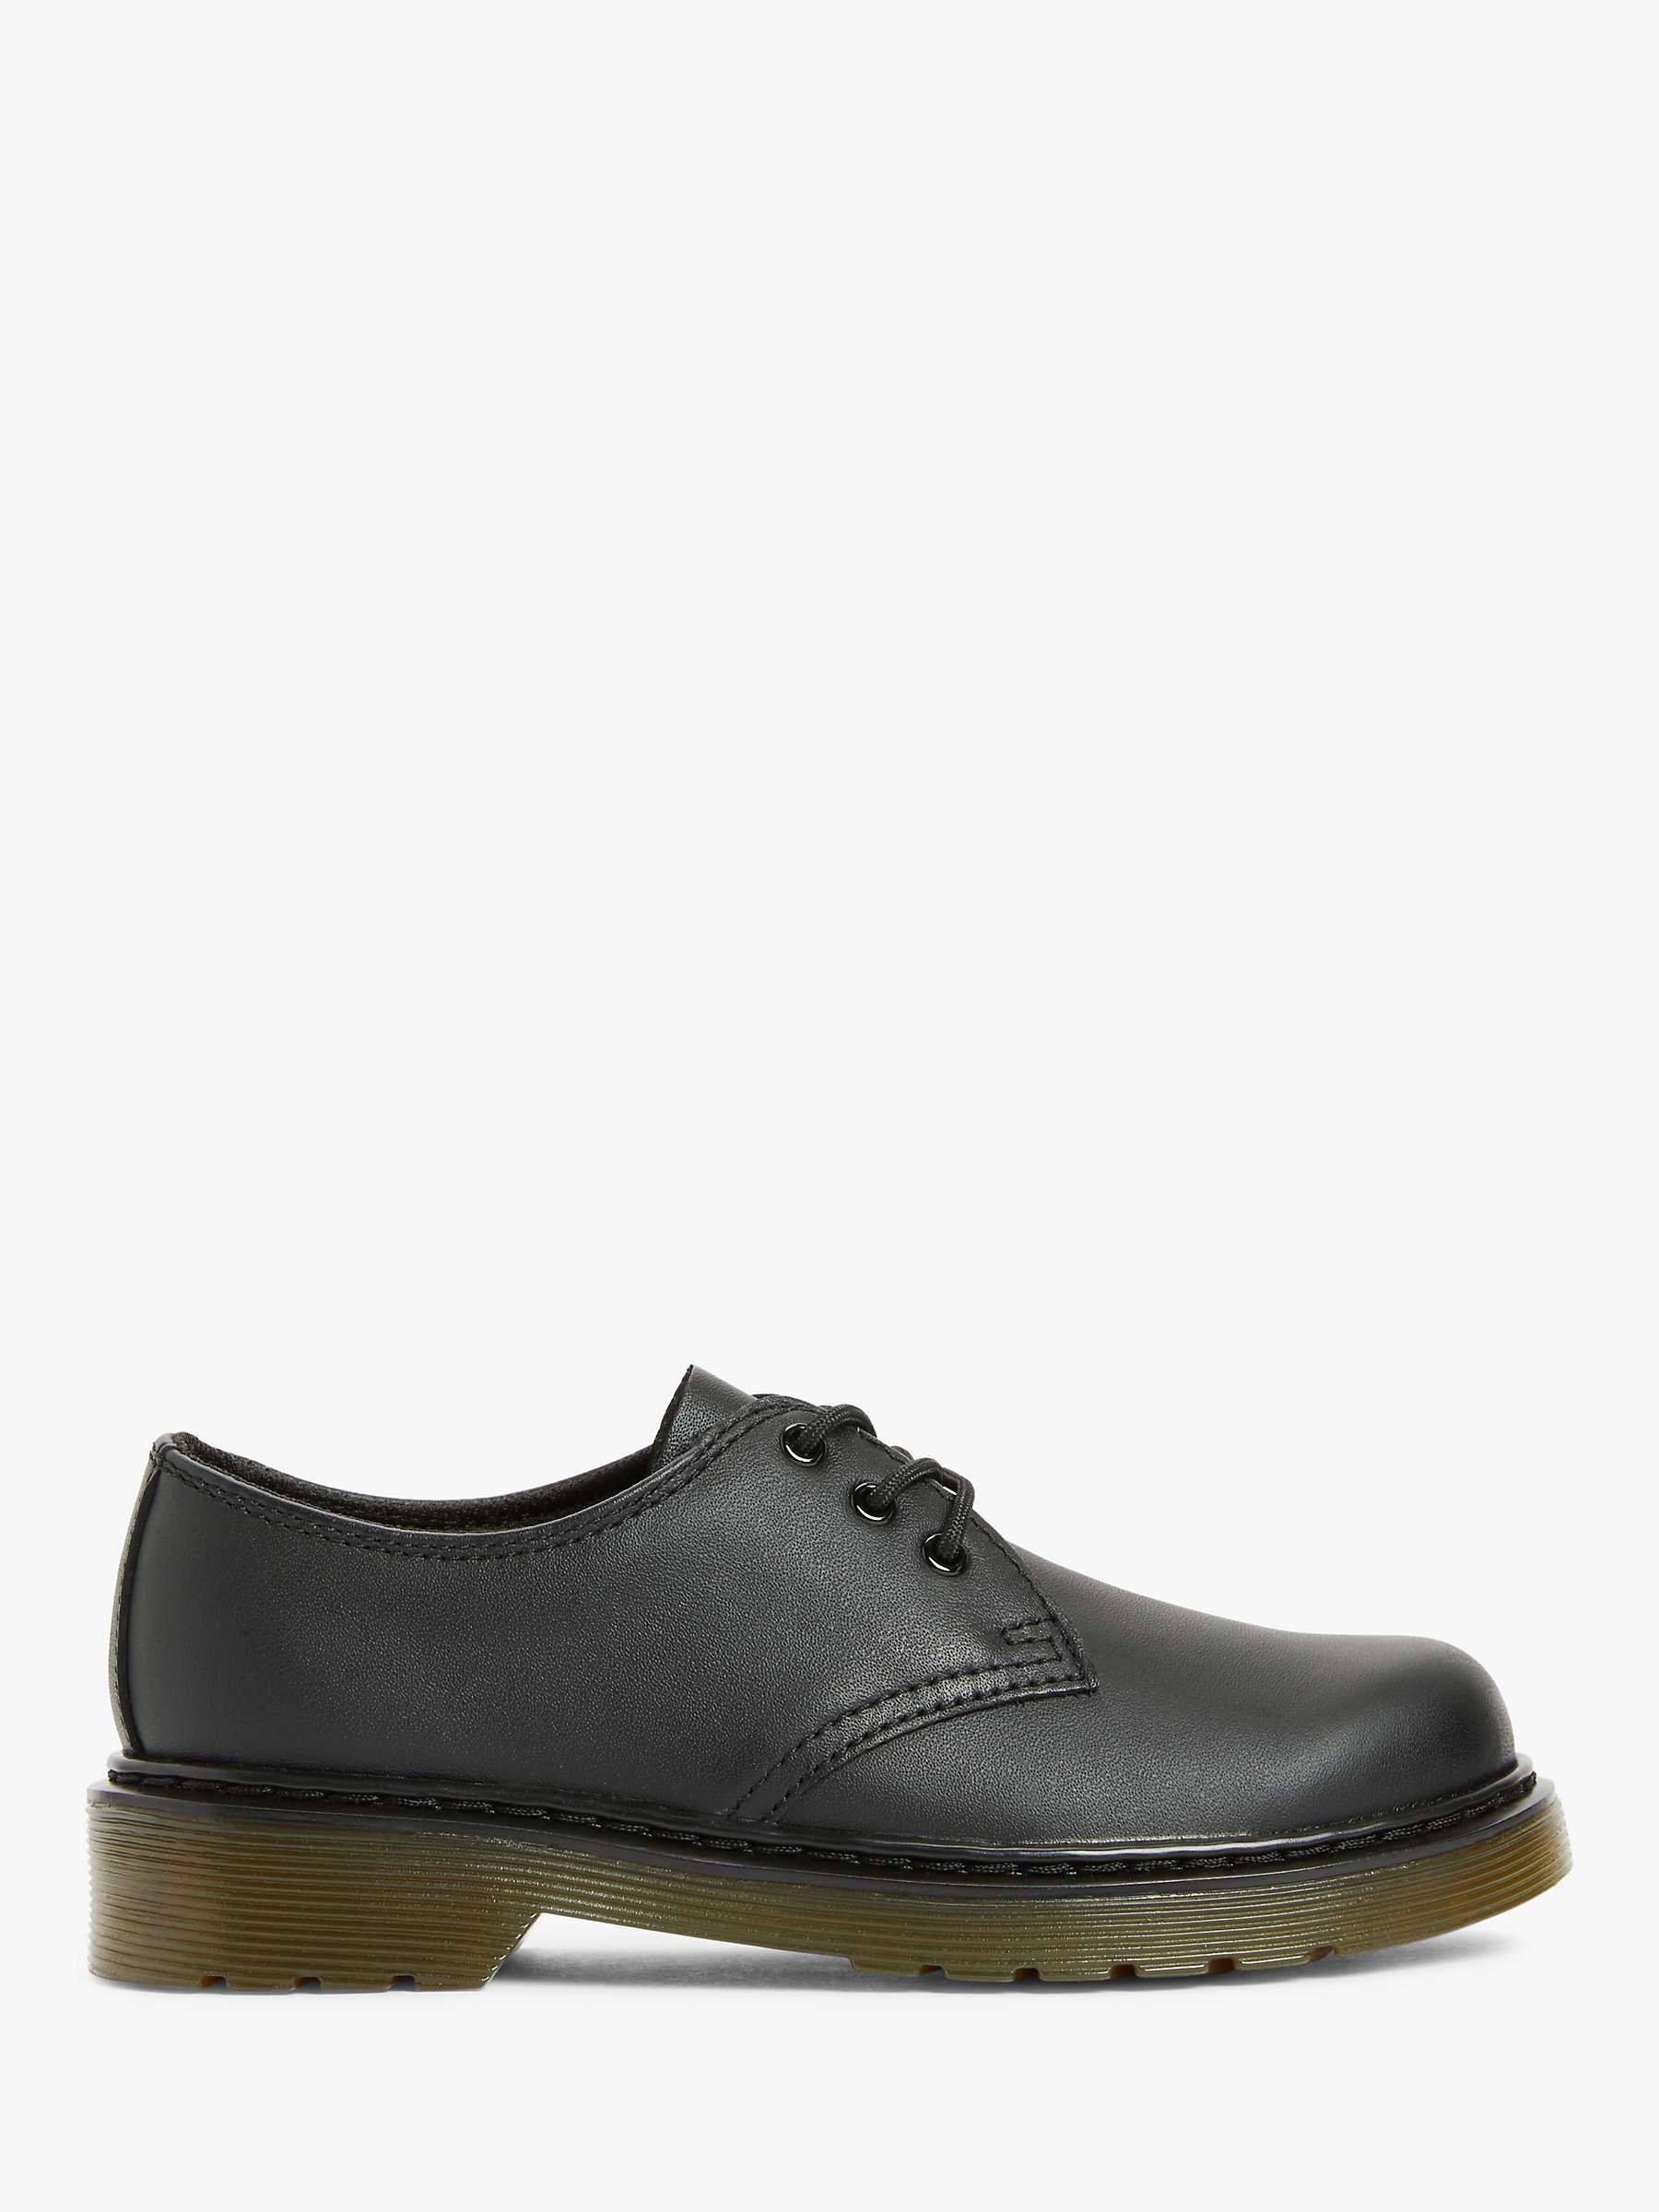 Dr Martens Junior 1461 Softy T Leather Lace Up Shoe Black